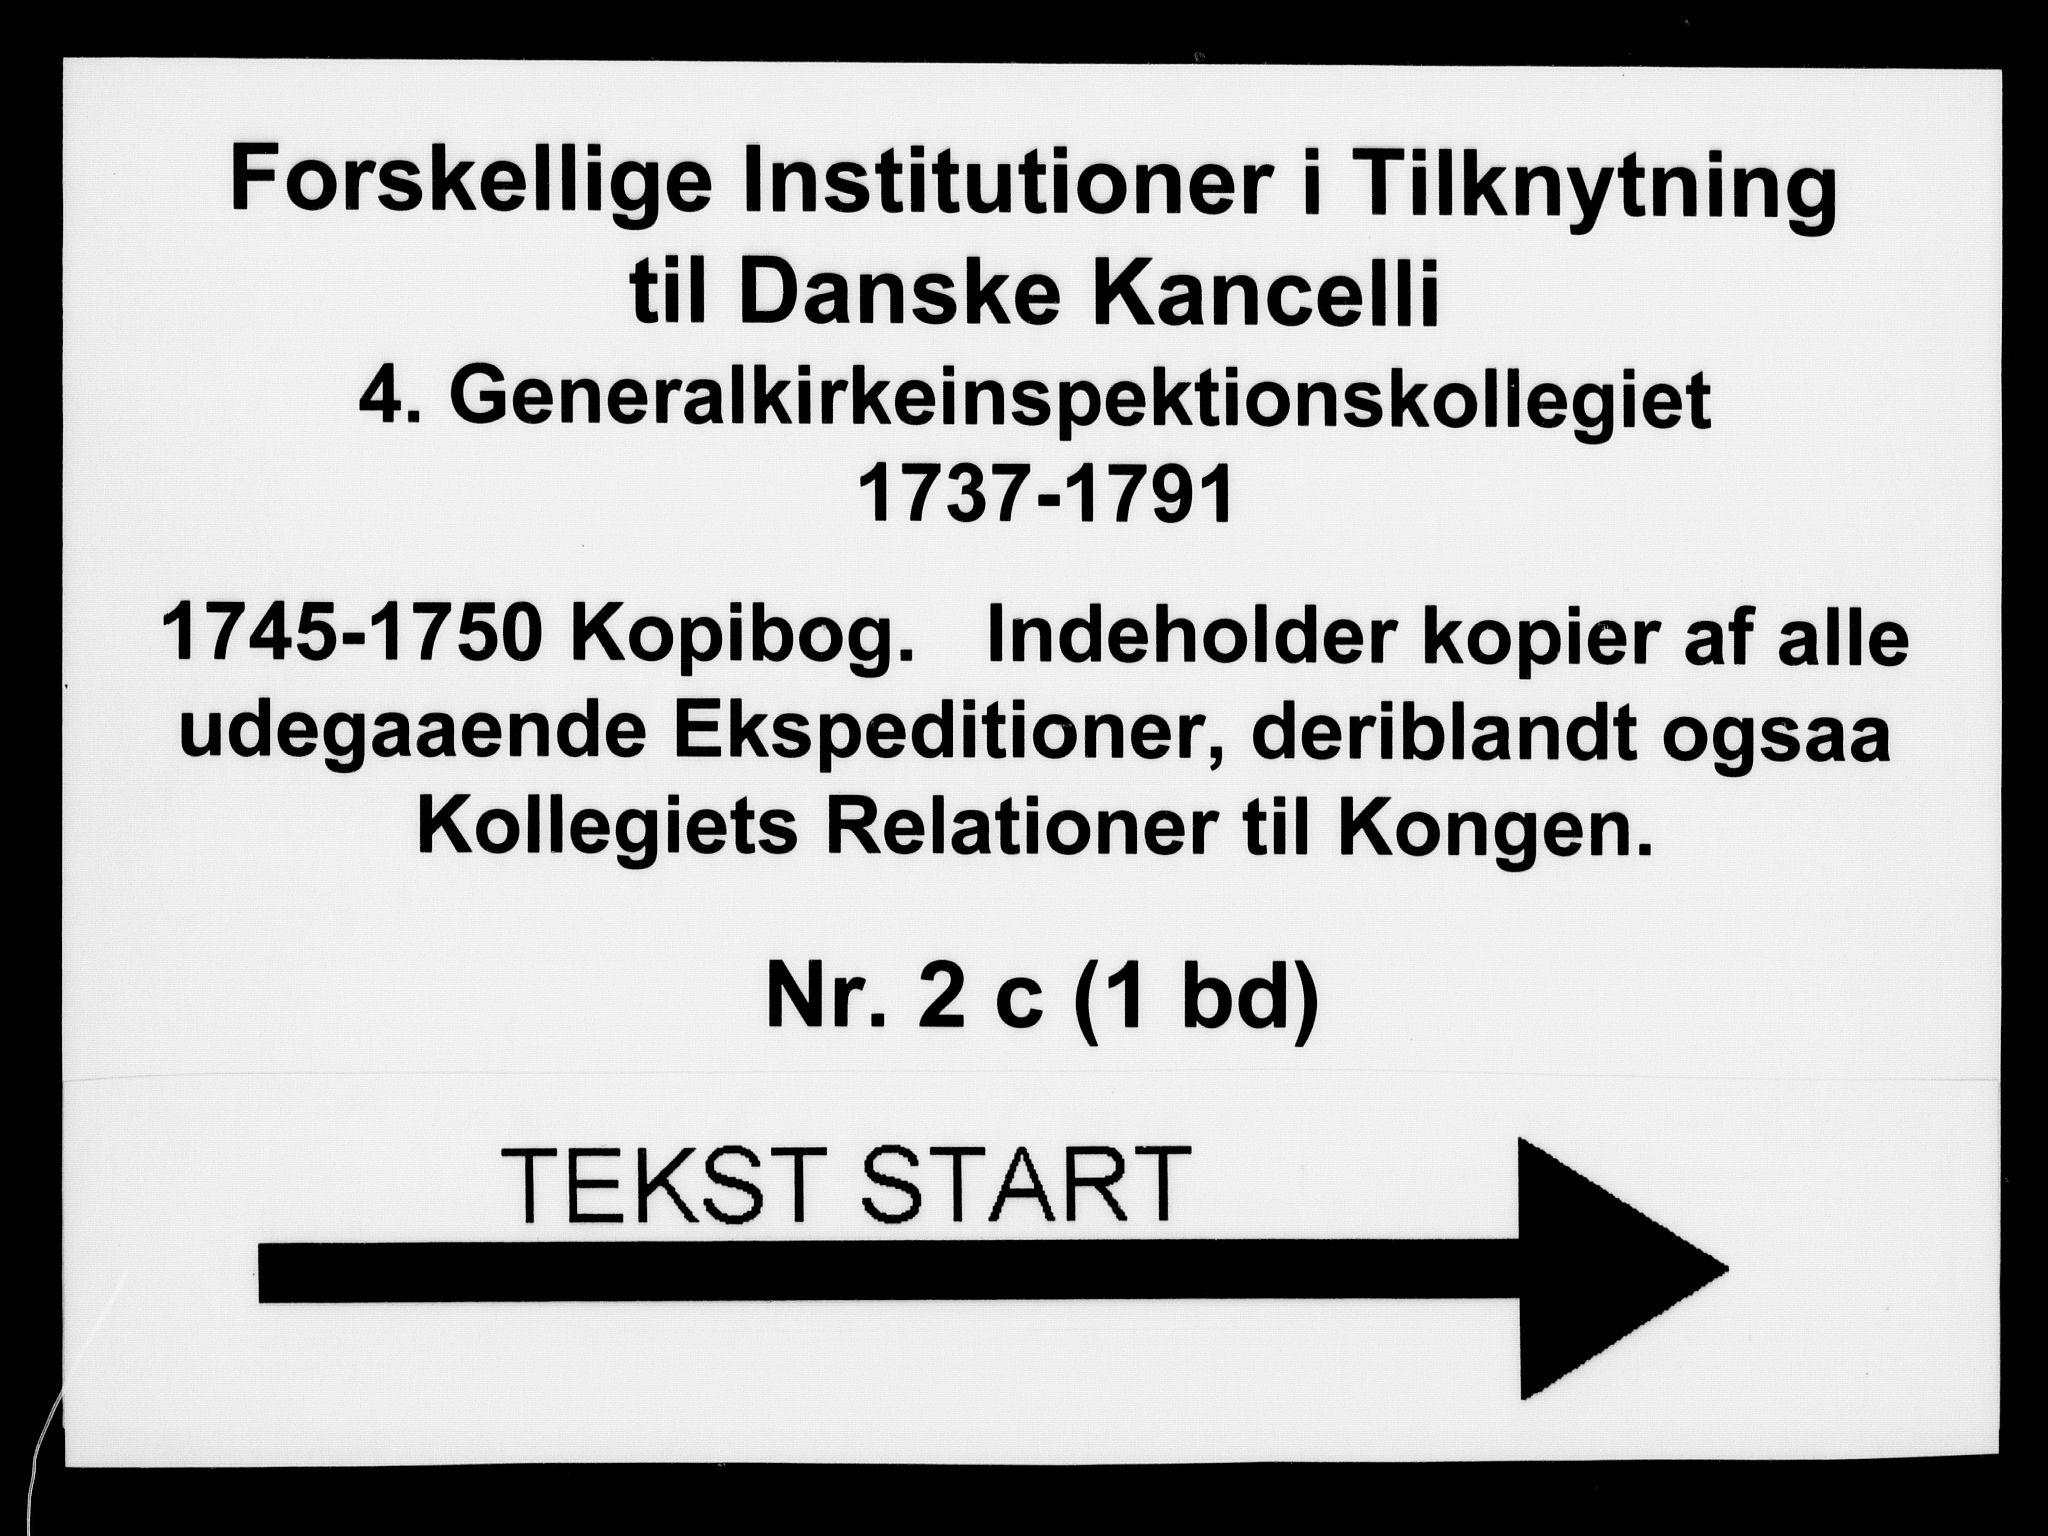 DRA, Generalkirkeinspektionskollegiet, F4-02/F4-02-03: Kopibog, 1745-1750